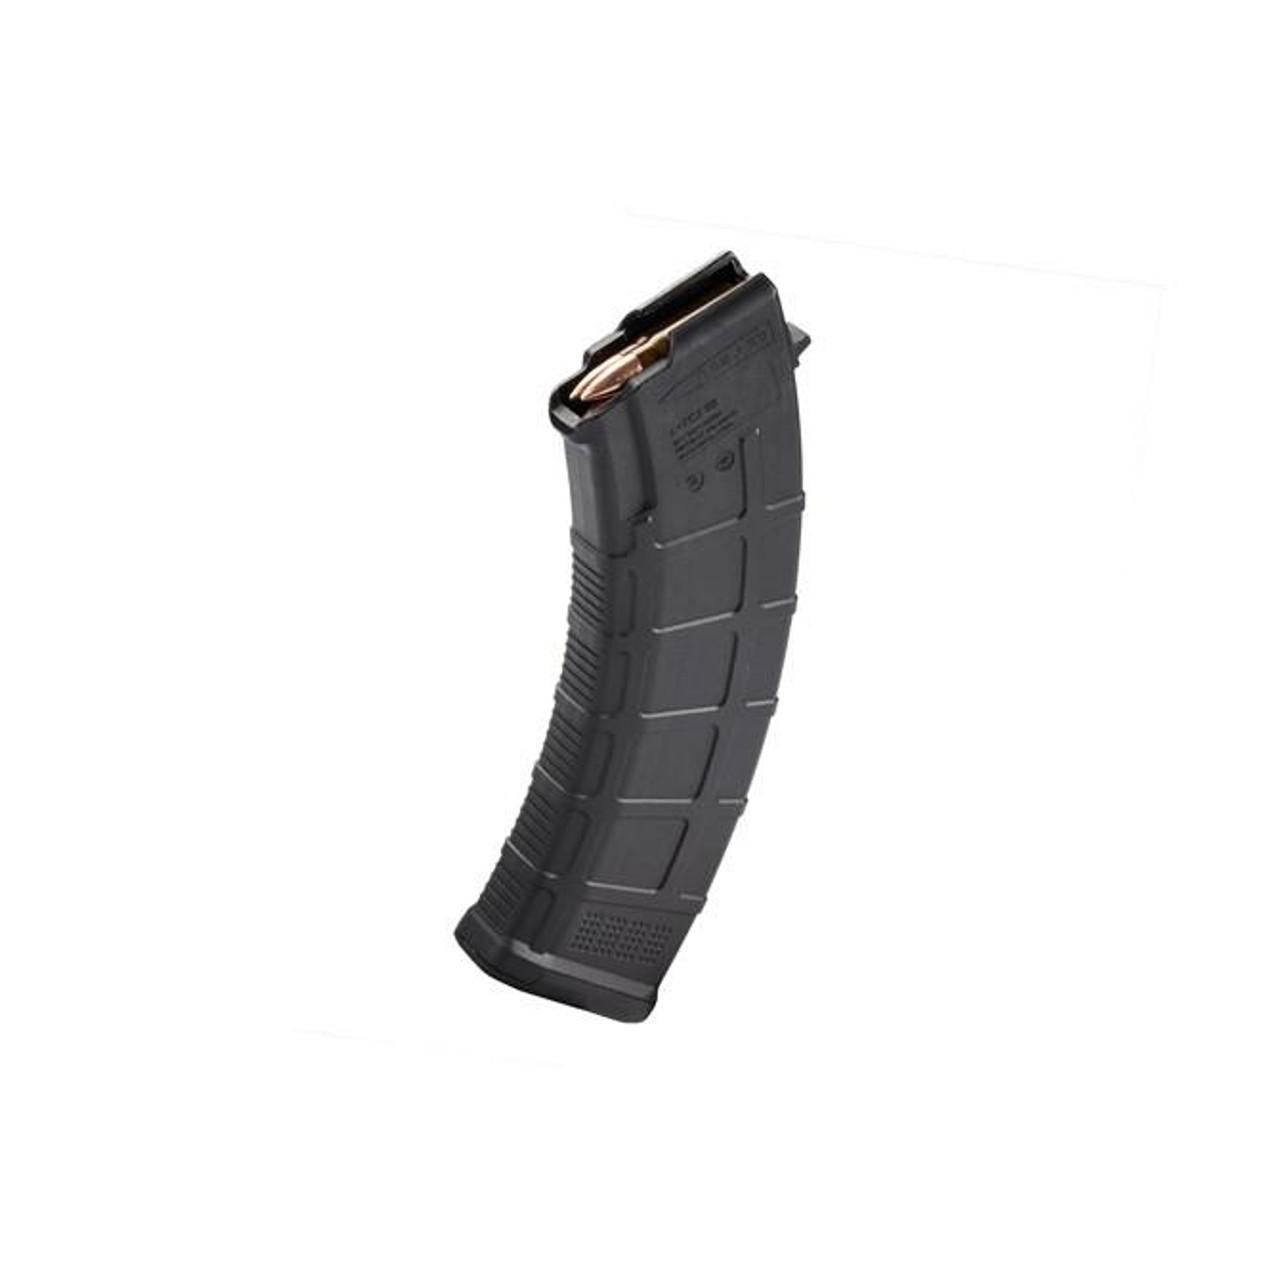 MAGPUL MOE 30 Round PMAG 7.62 x 39mm AK-47 Magazine